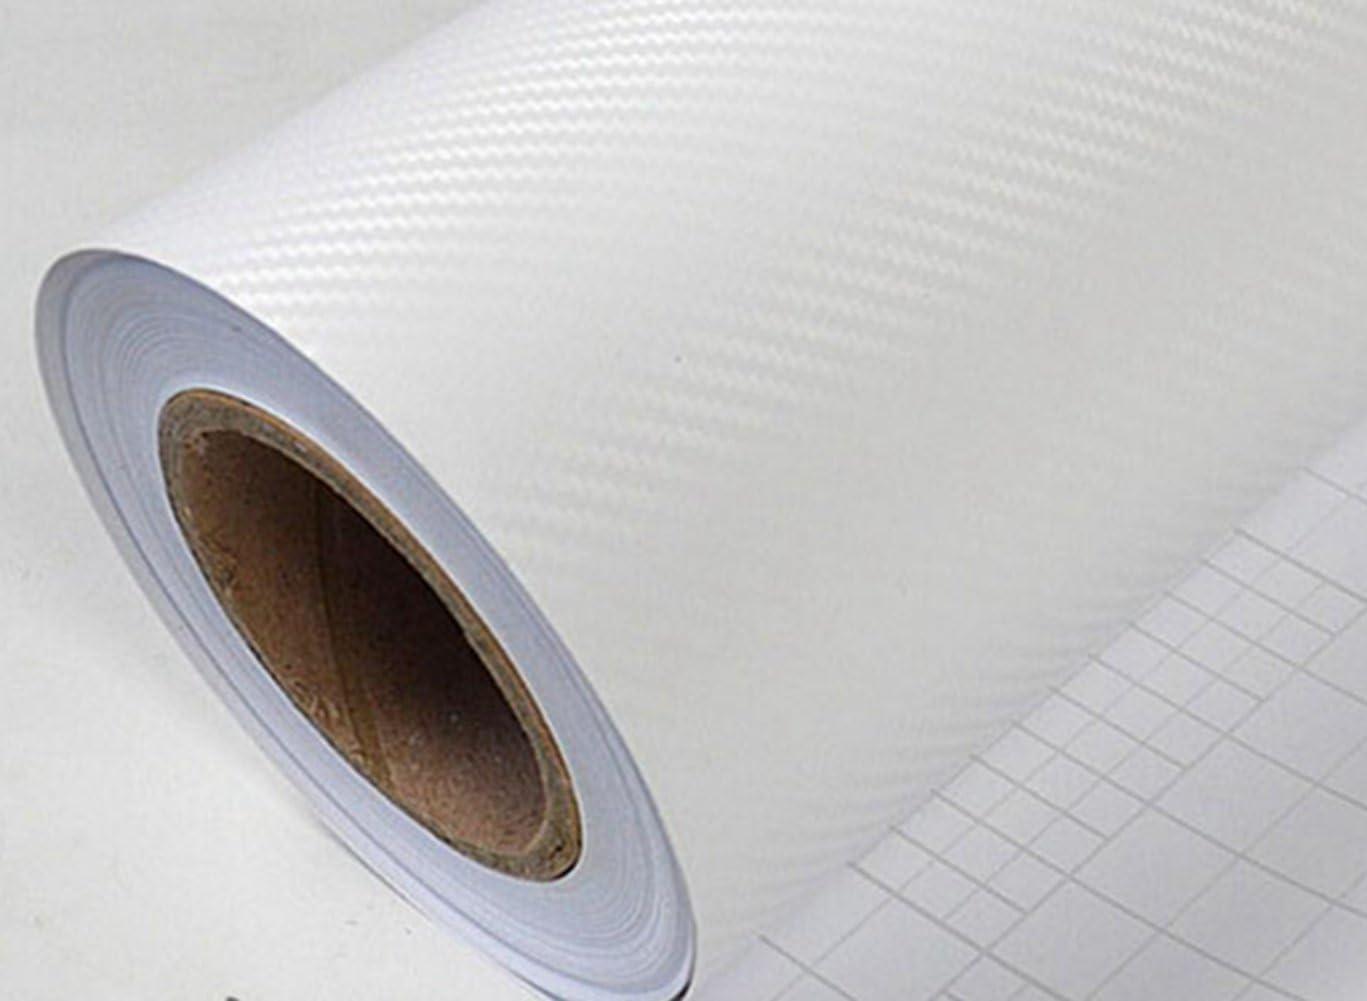 White self-Adhesive Wallpaper, Carbon Fiber Vinyl Wrap Roll,Carbon Fiber self-Adhesive Paper, Anti-Scratch Film, Color Change Film, Contact Paper, Furniture Sticker, Waterproof Decorative Sticker